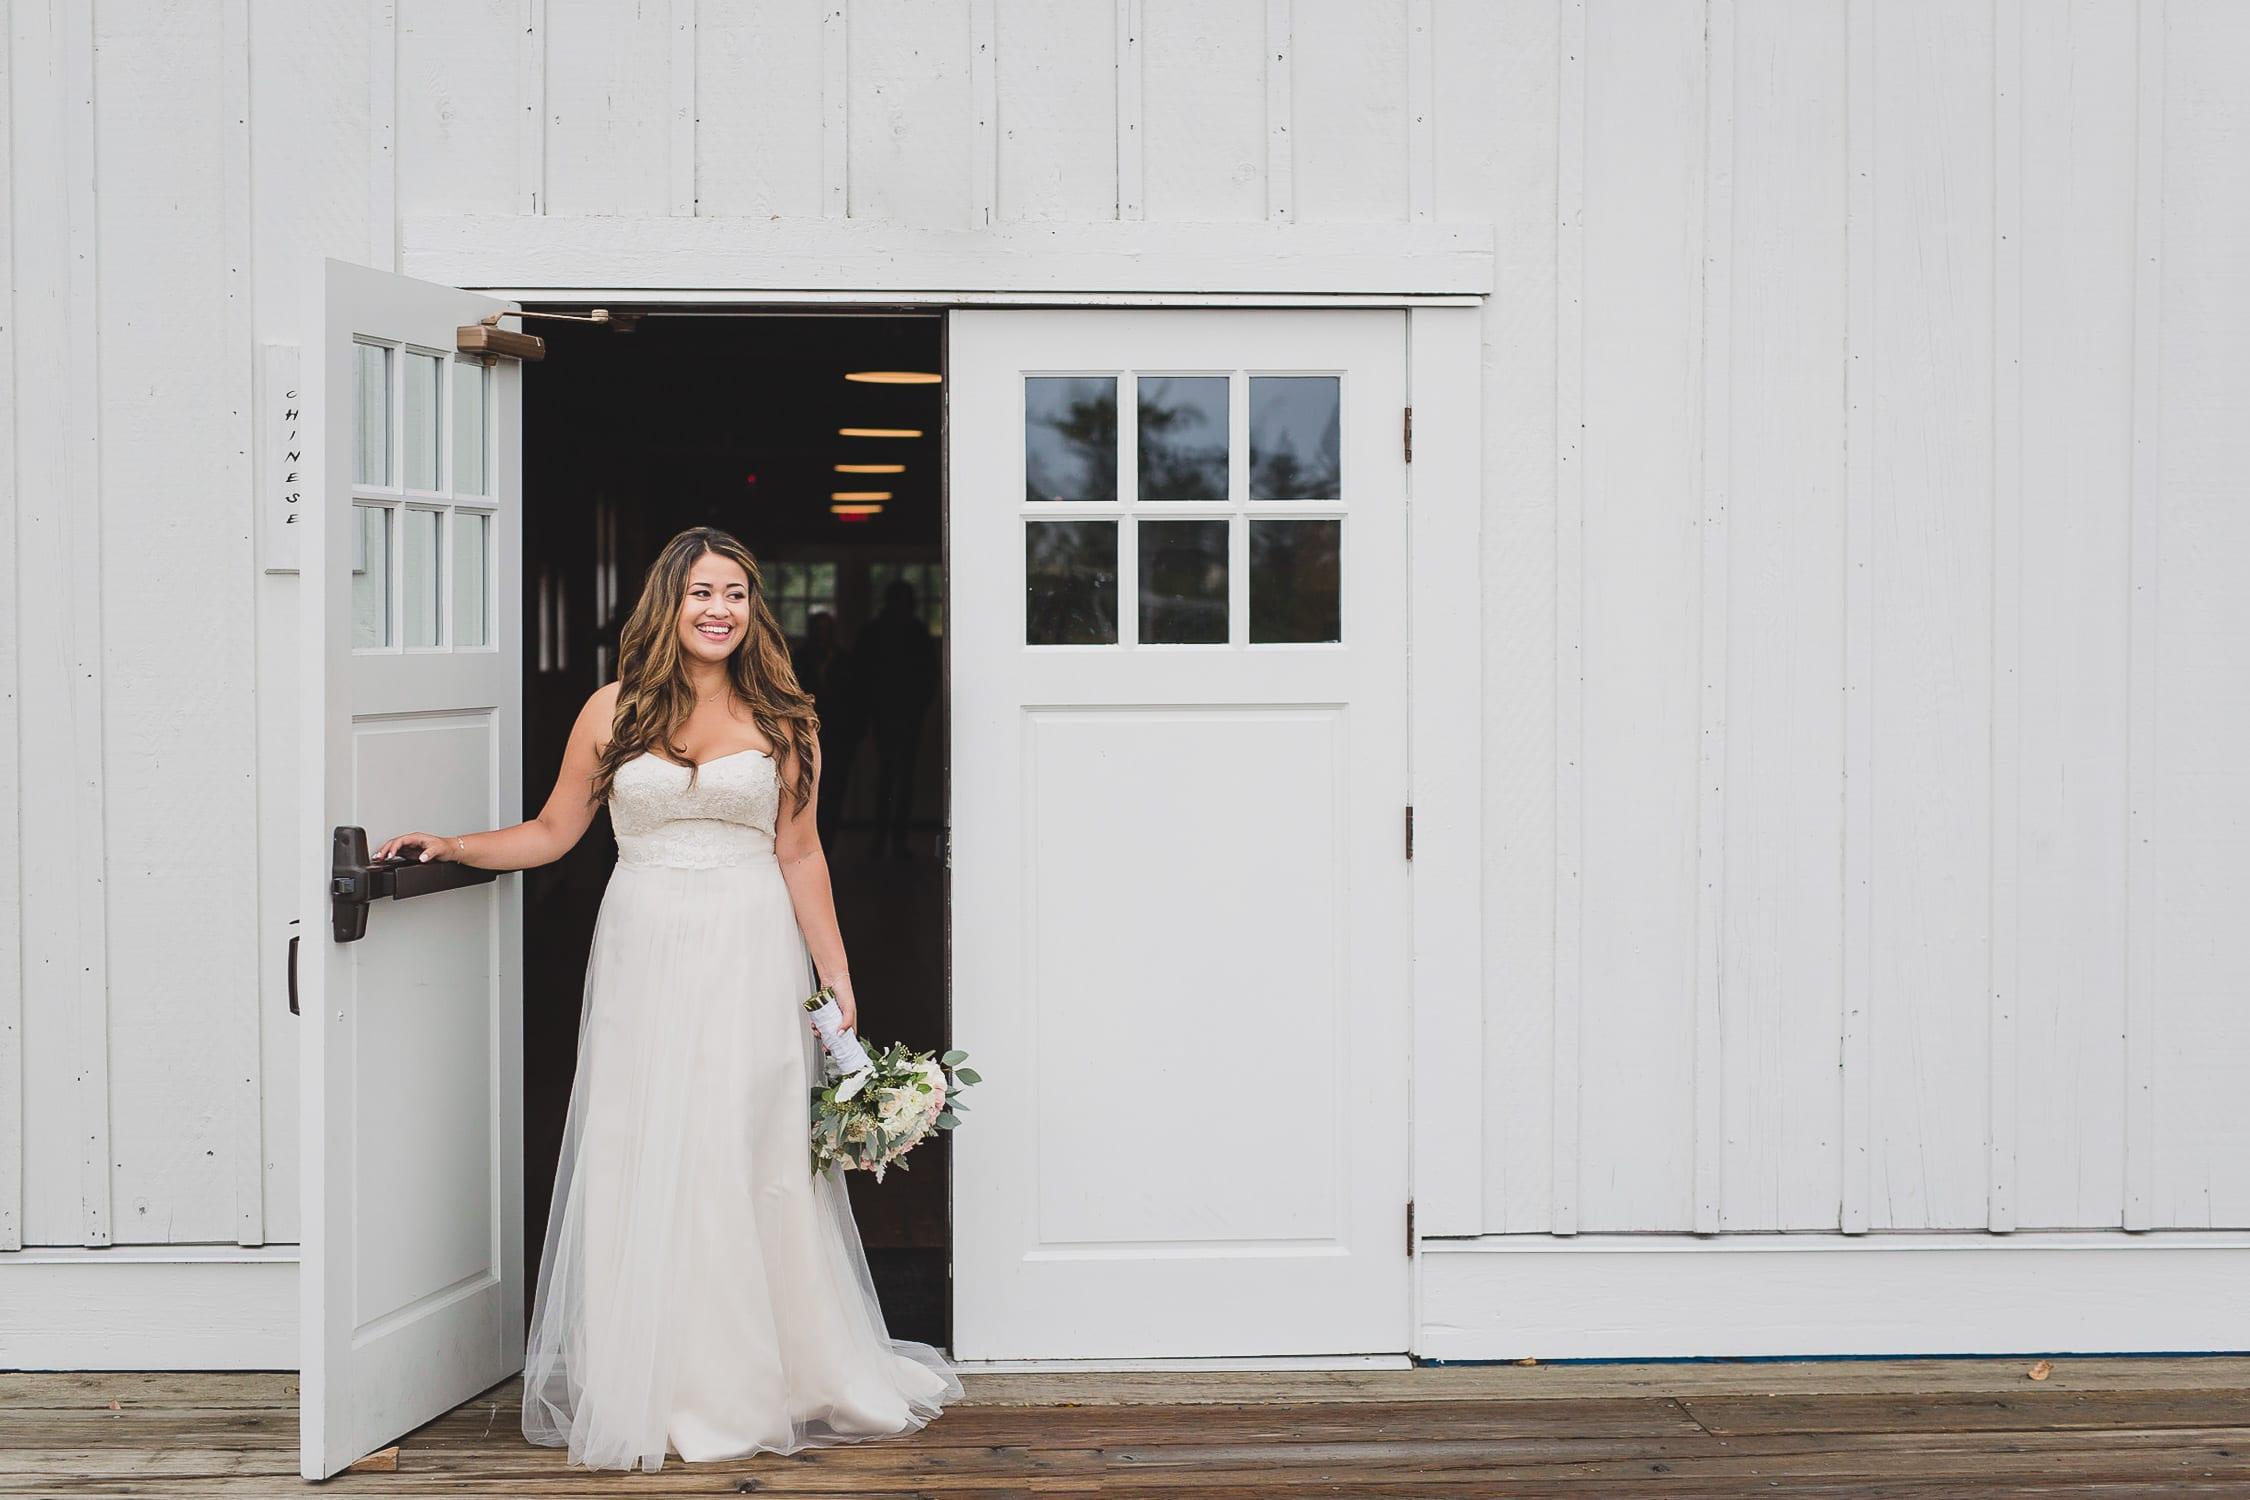 bride portrait at brittania shipyards in steveston